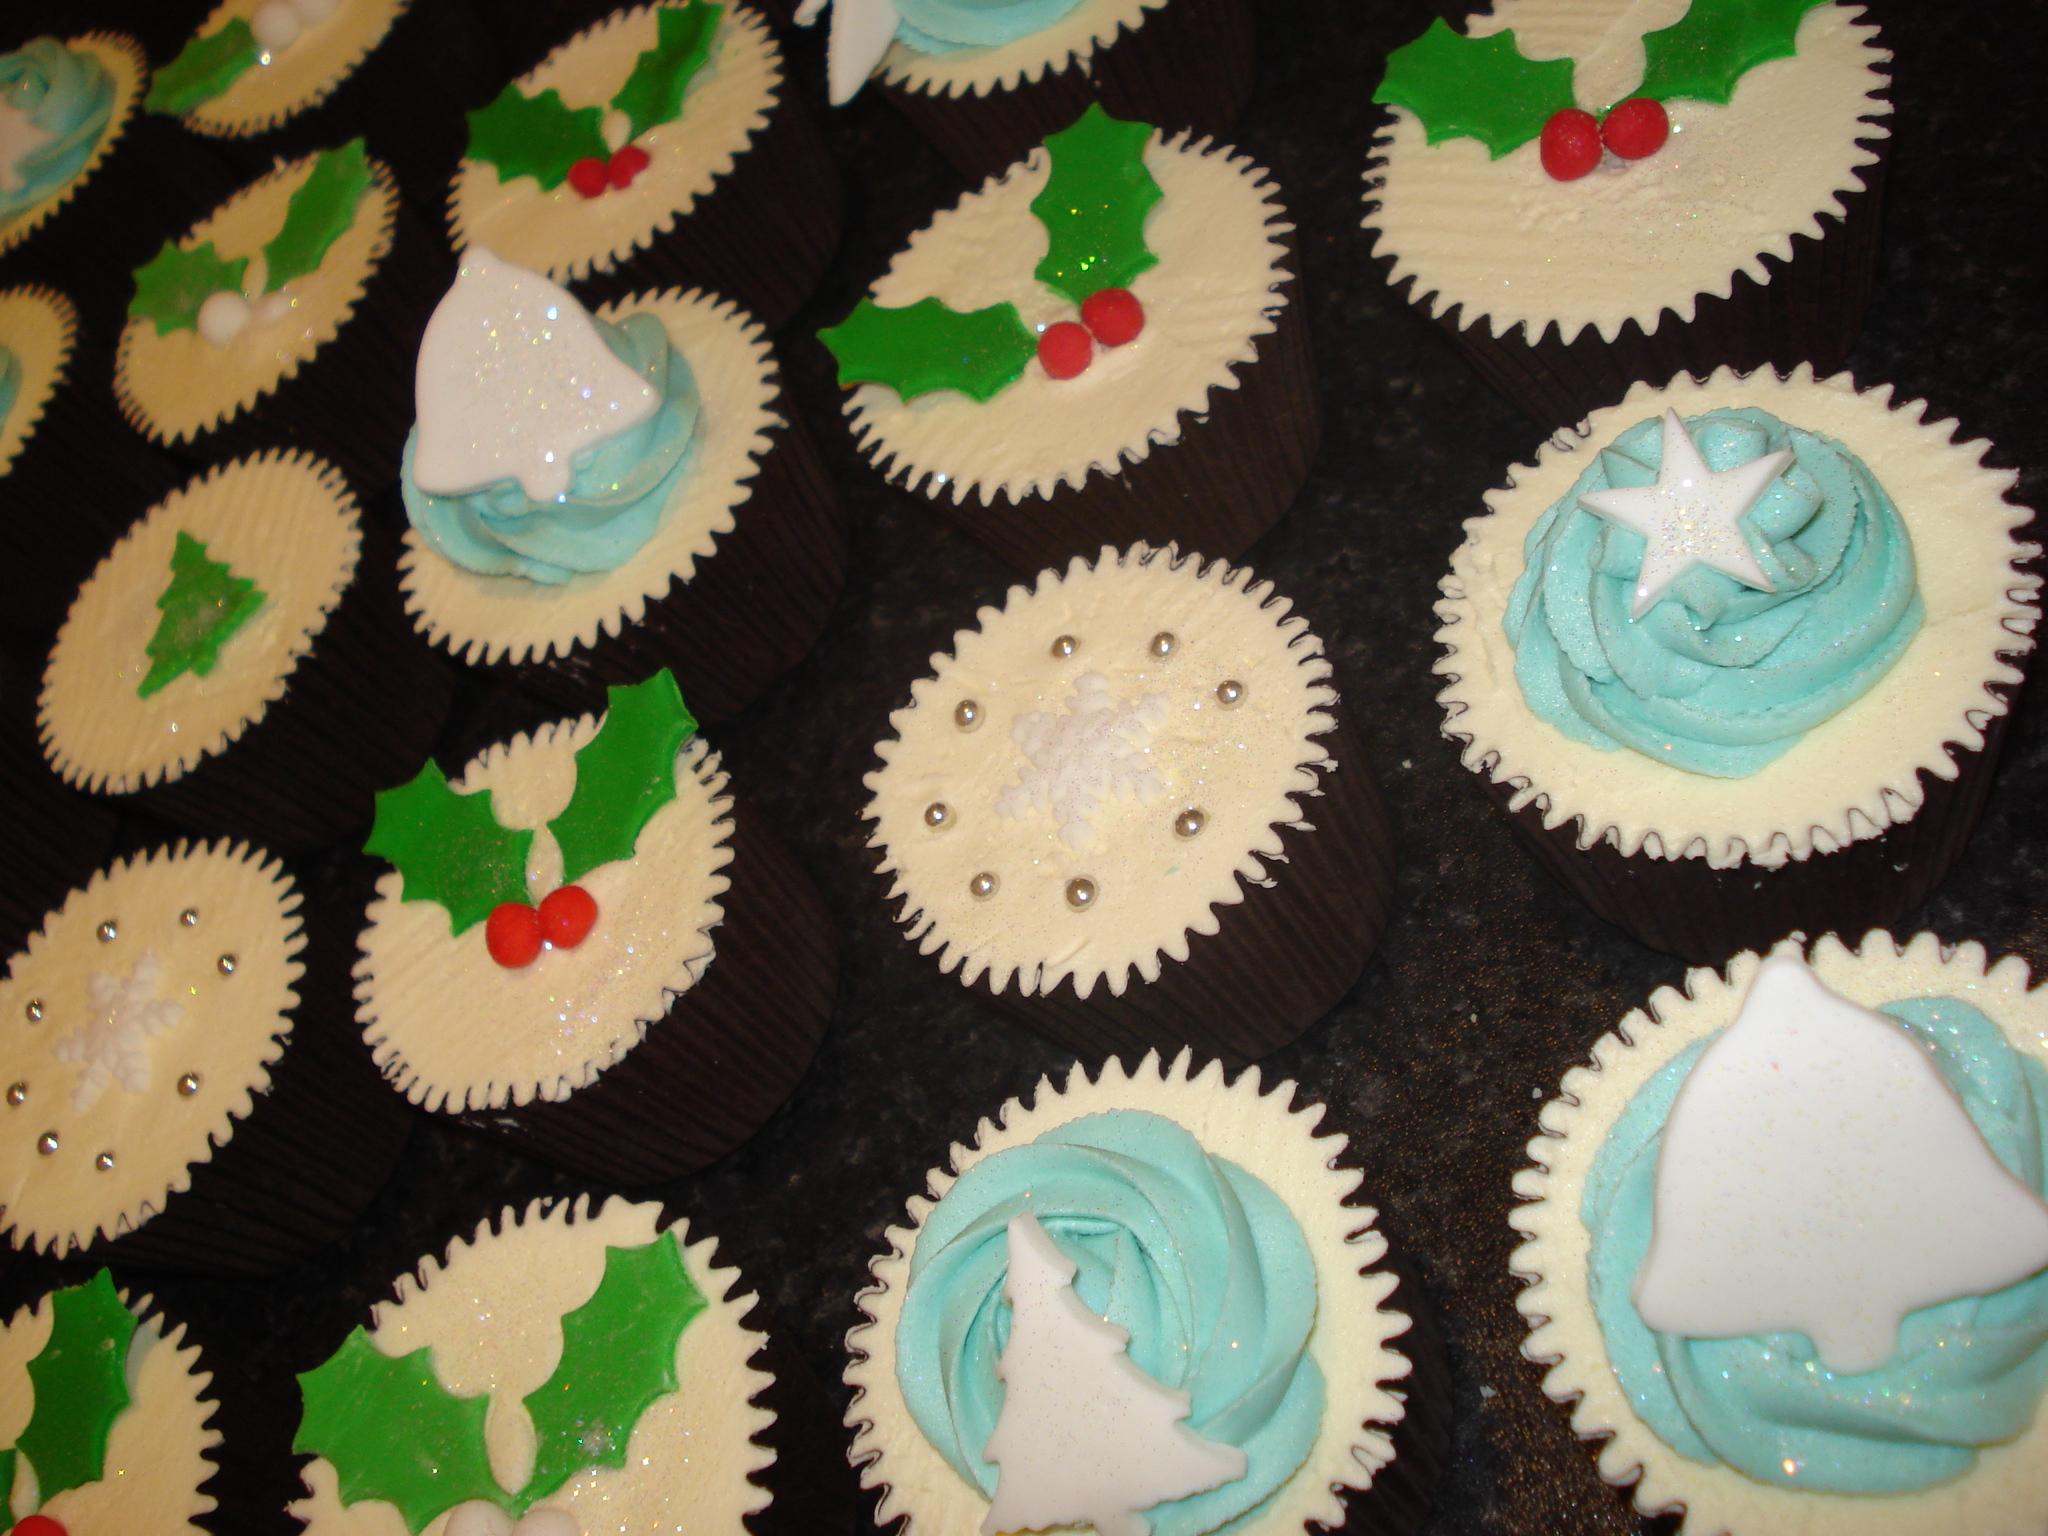 Bells, trees, holly, snowflake cupcakes